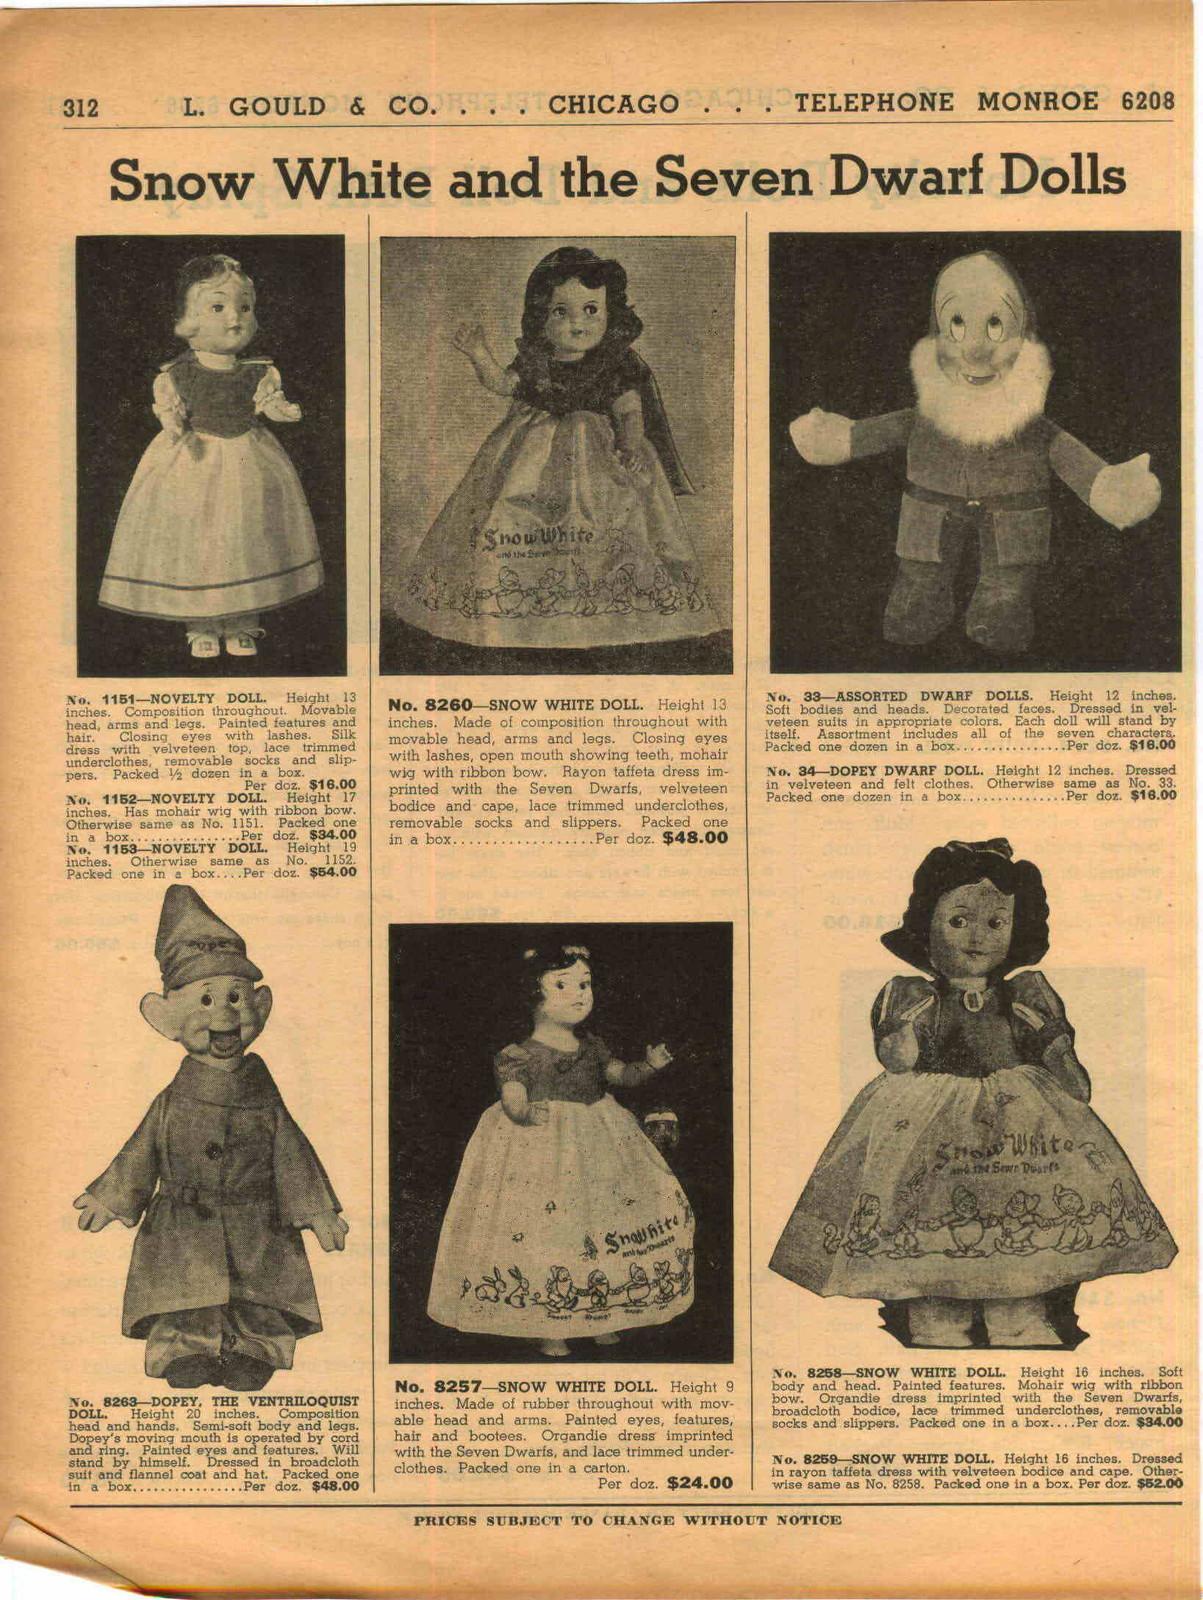 Filmic Light - Snow White Archive: Vintage Catalog Listings